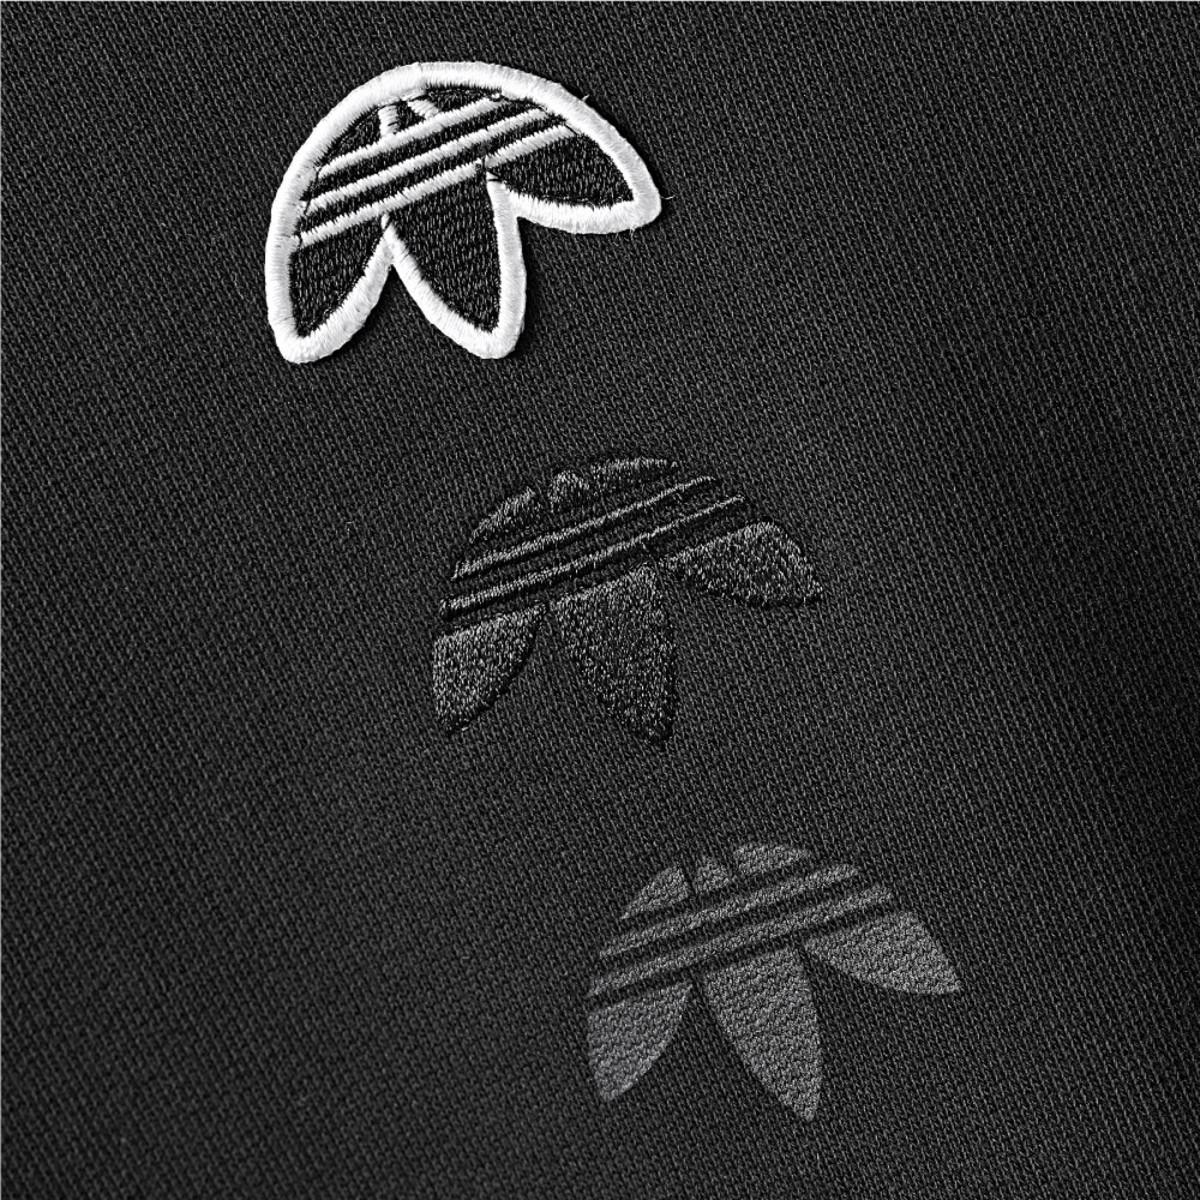 ad63241bb9d adidas alexander wang hat